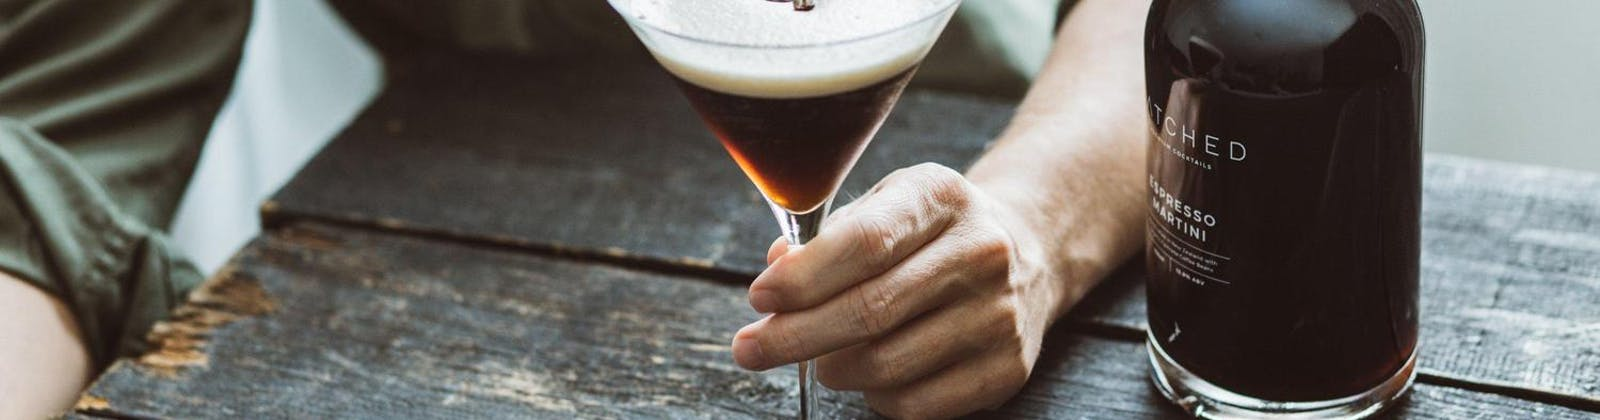 batched's espresso martinis